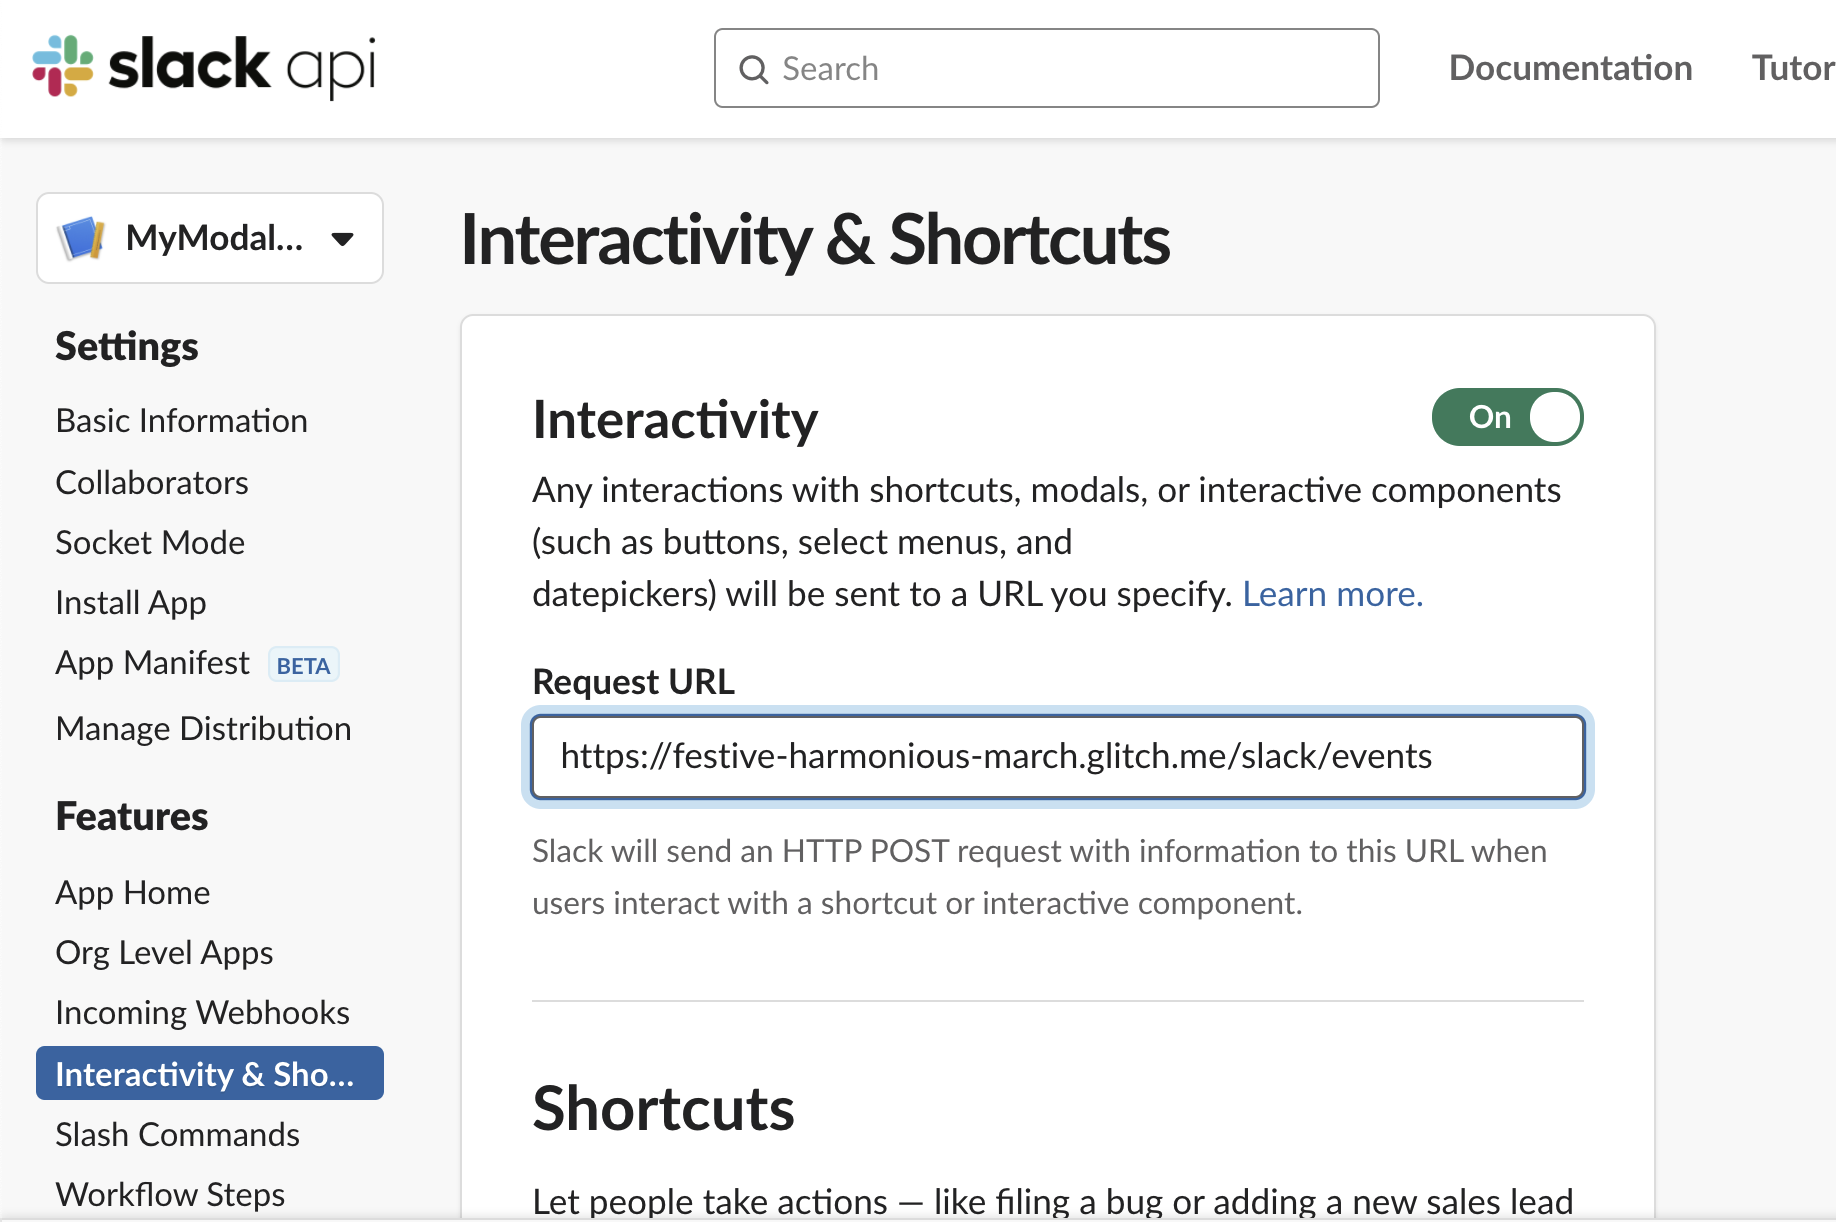 interactivity URL